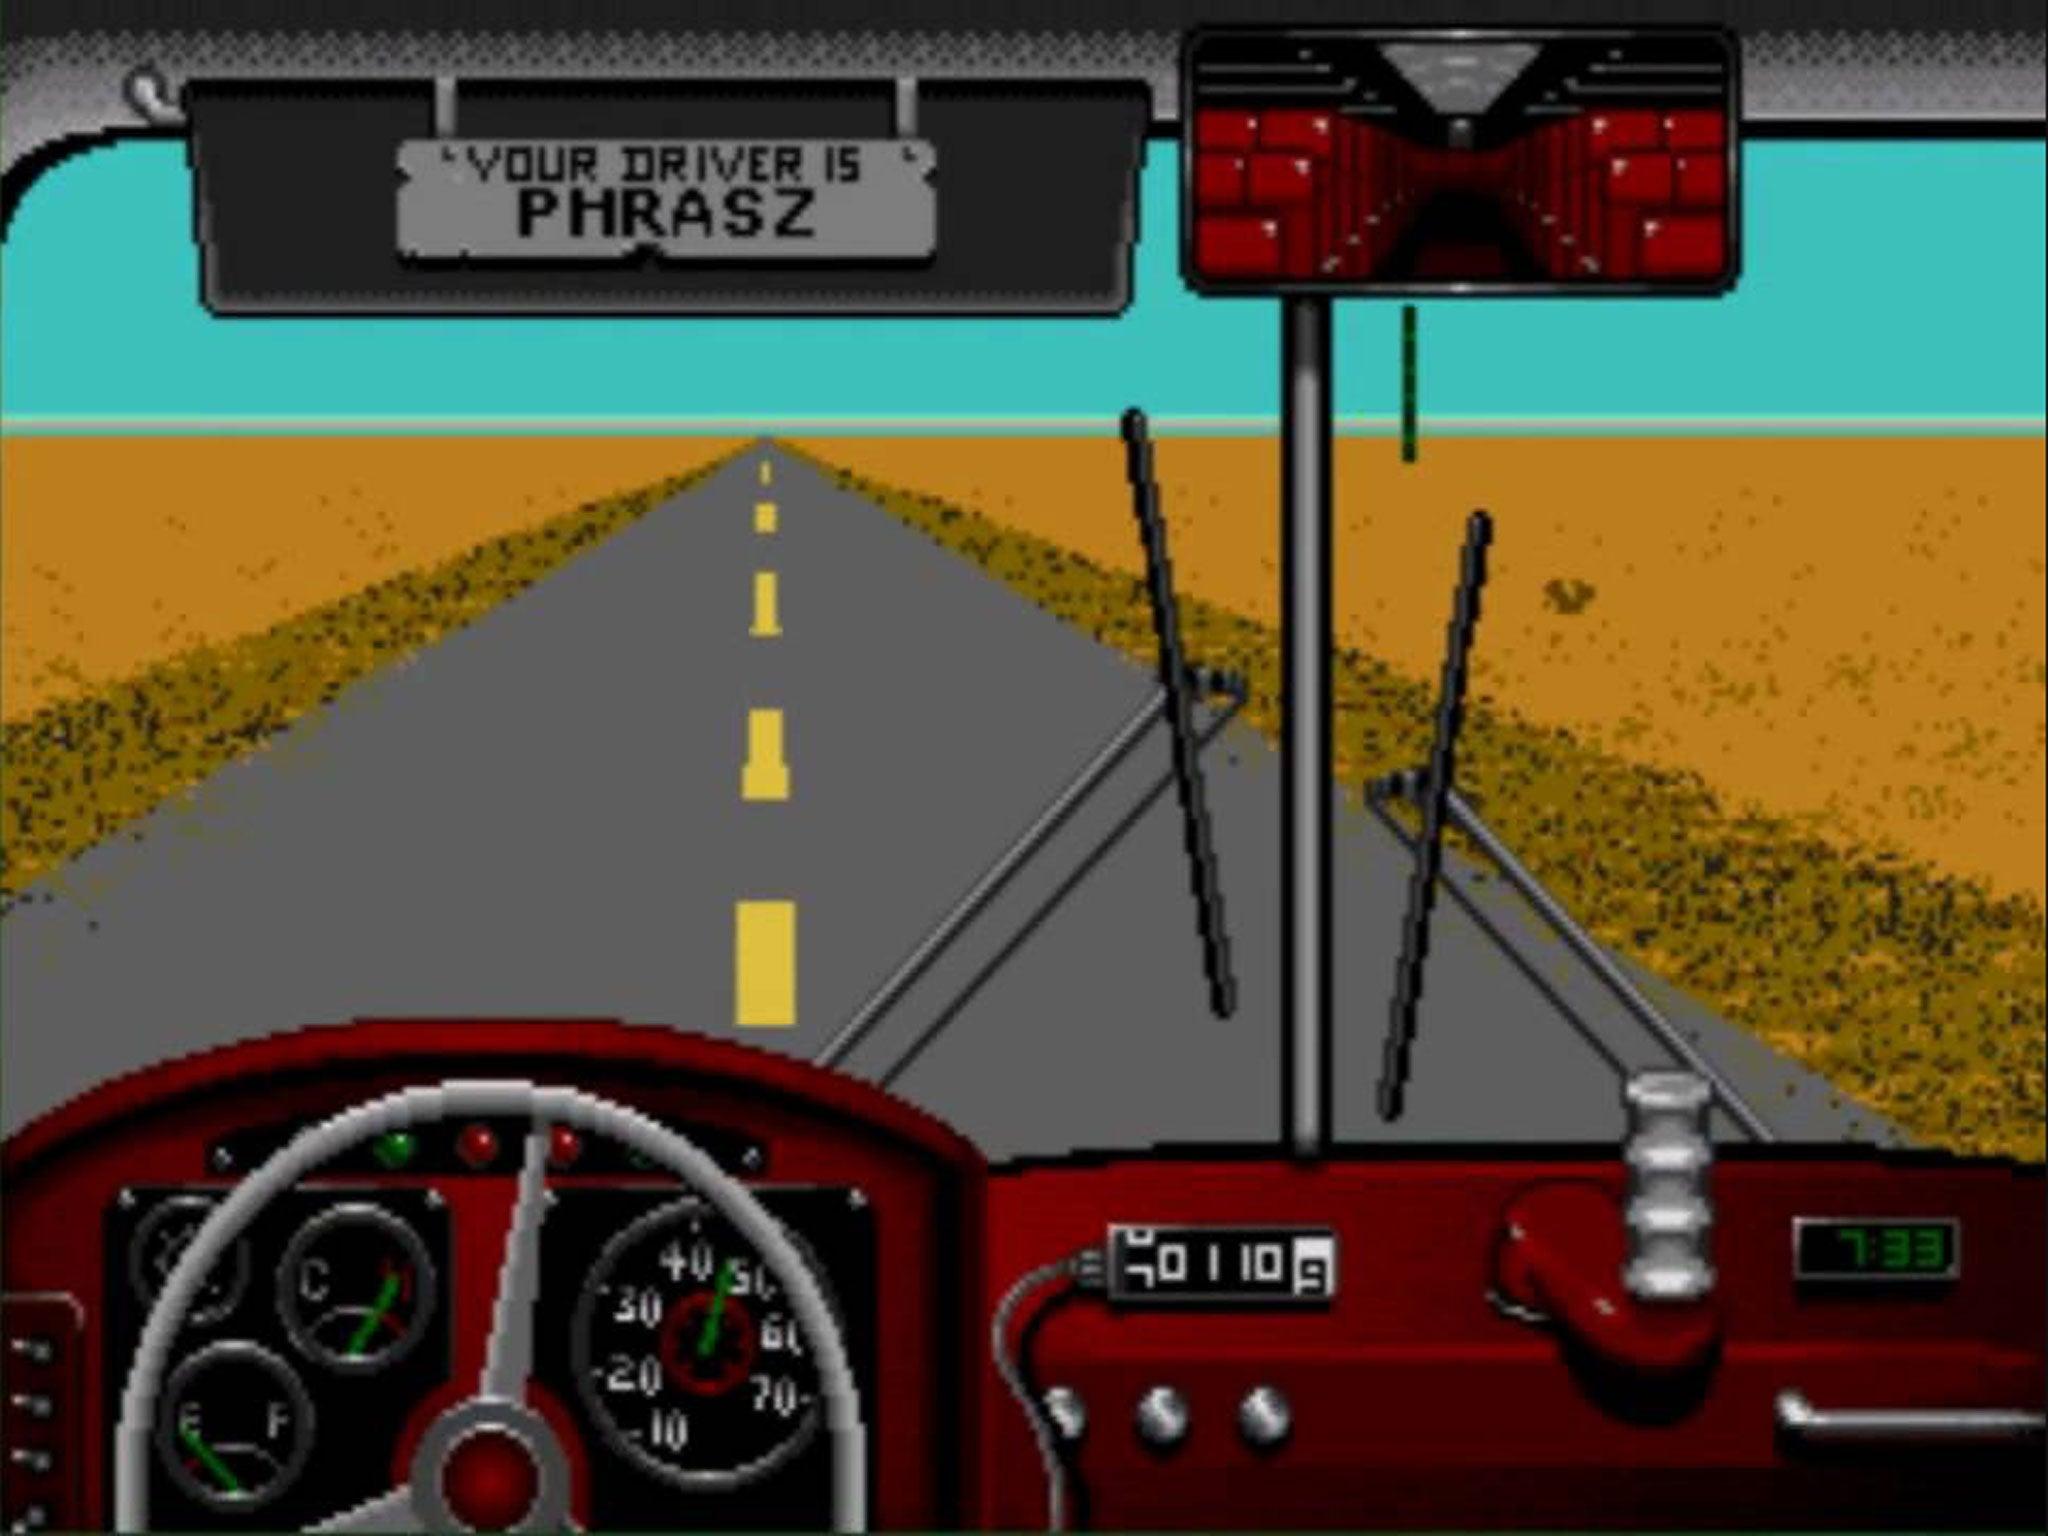 Desert Bus: Drive straight for eight hours – inside the